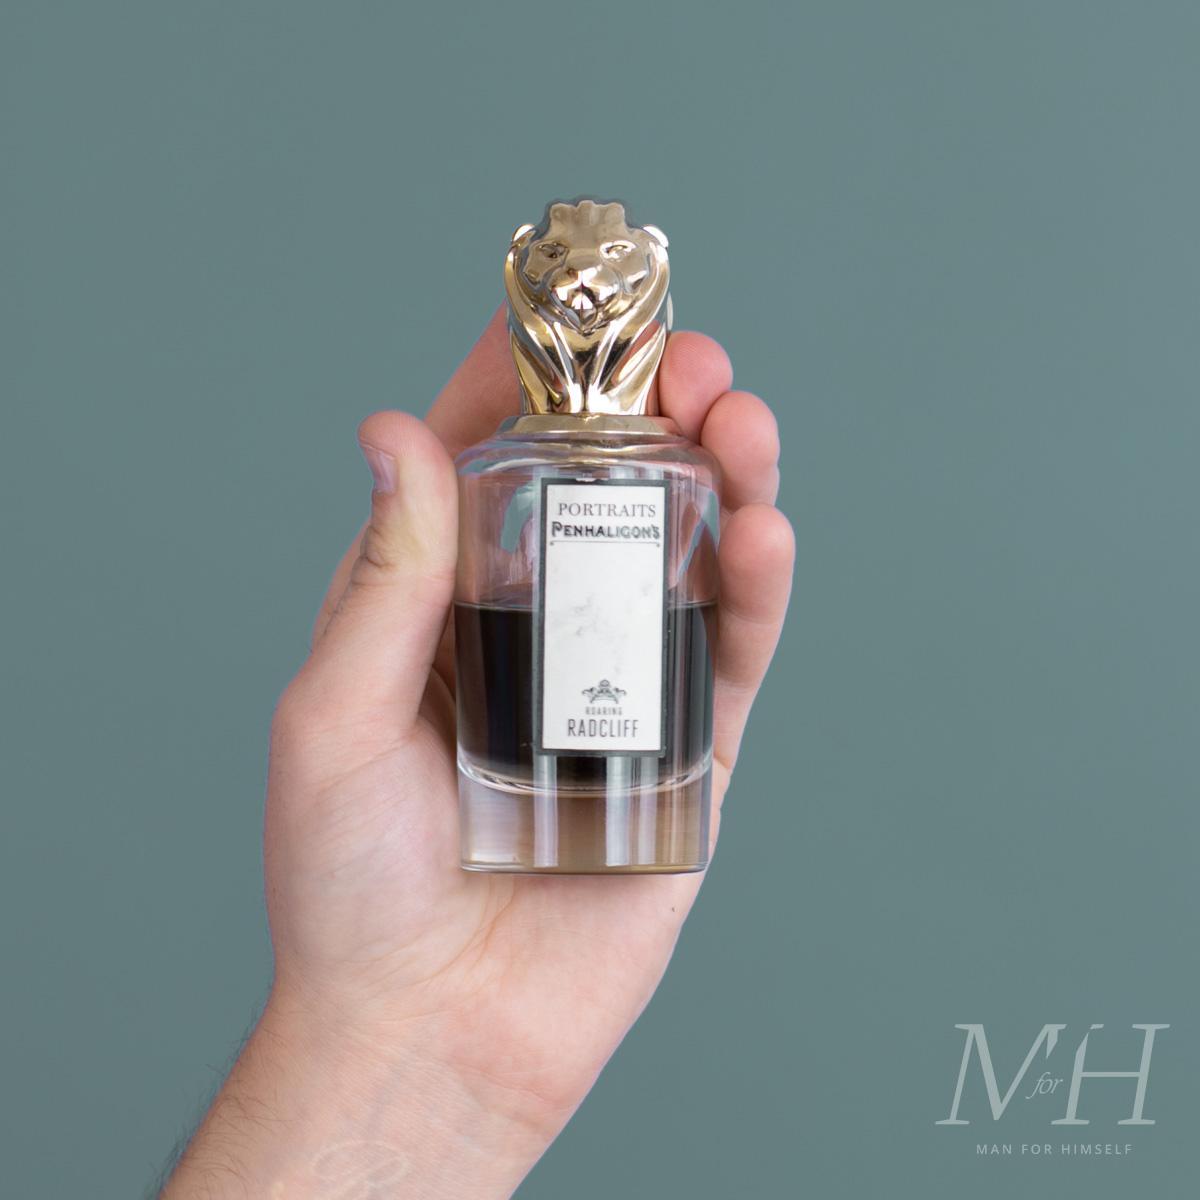 penhaligons-roaring-radcliff-review-mens-fragrance-best-price-2